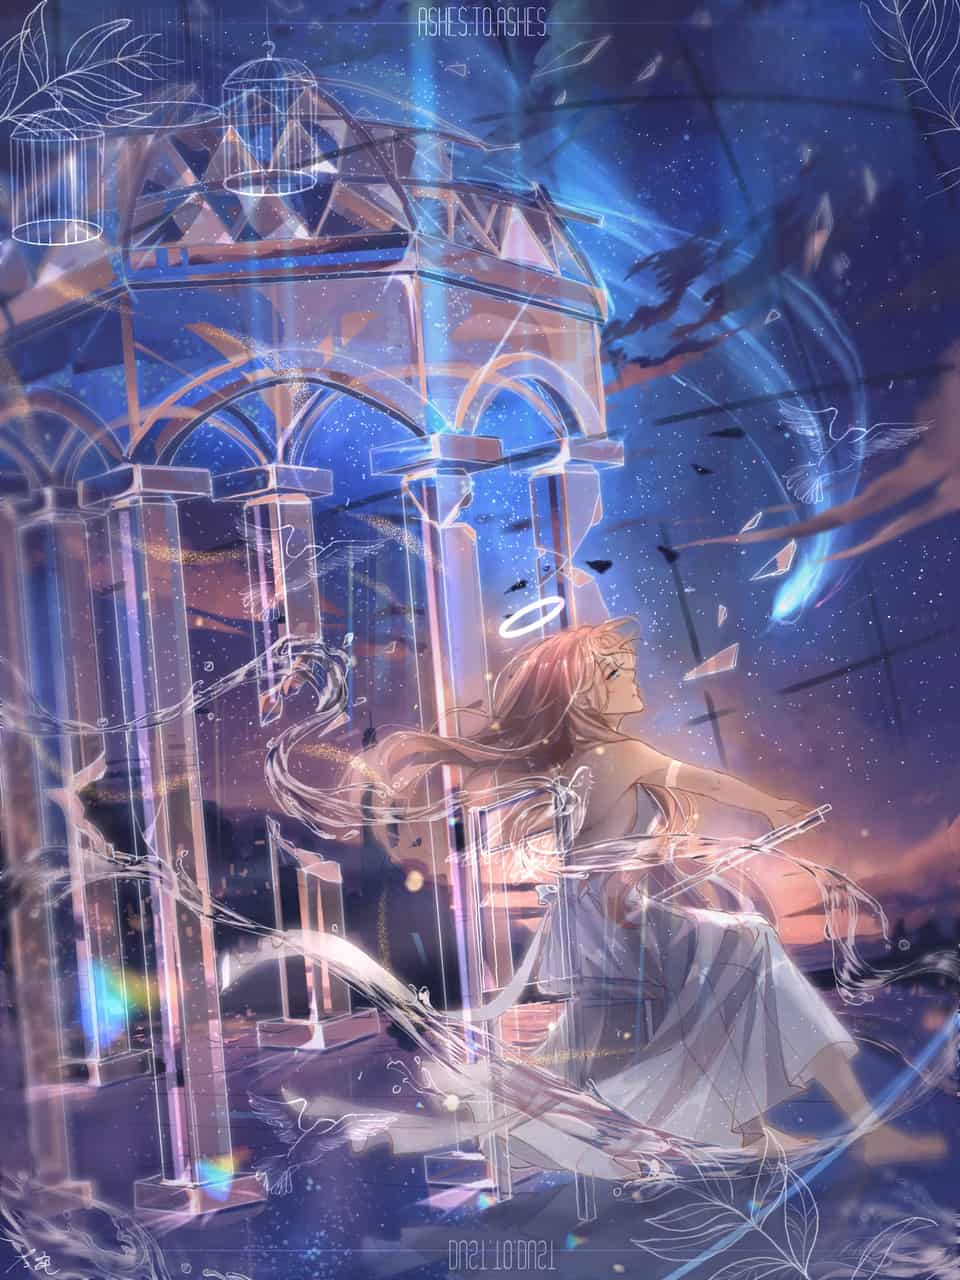 真就喜欢些 Illust of 那我男神就张培基吧 starry_sky girl original illustration water